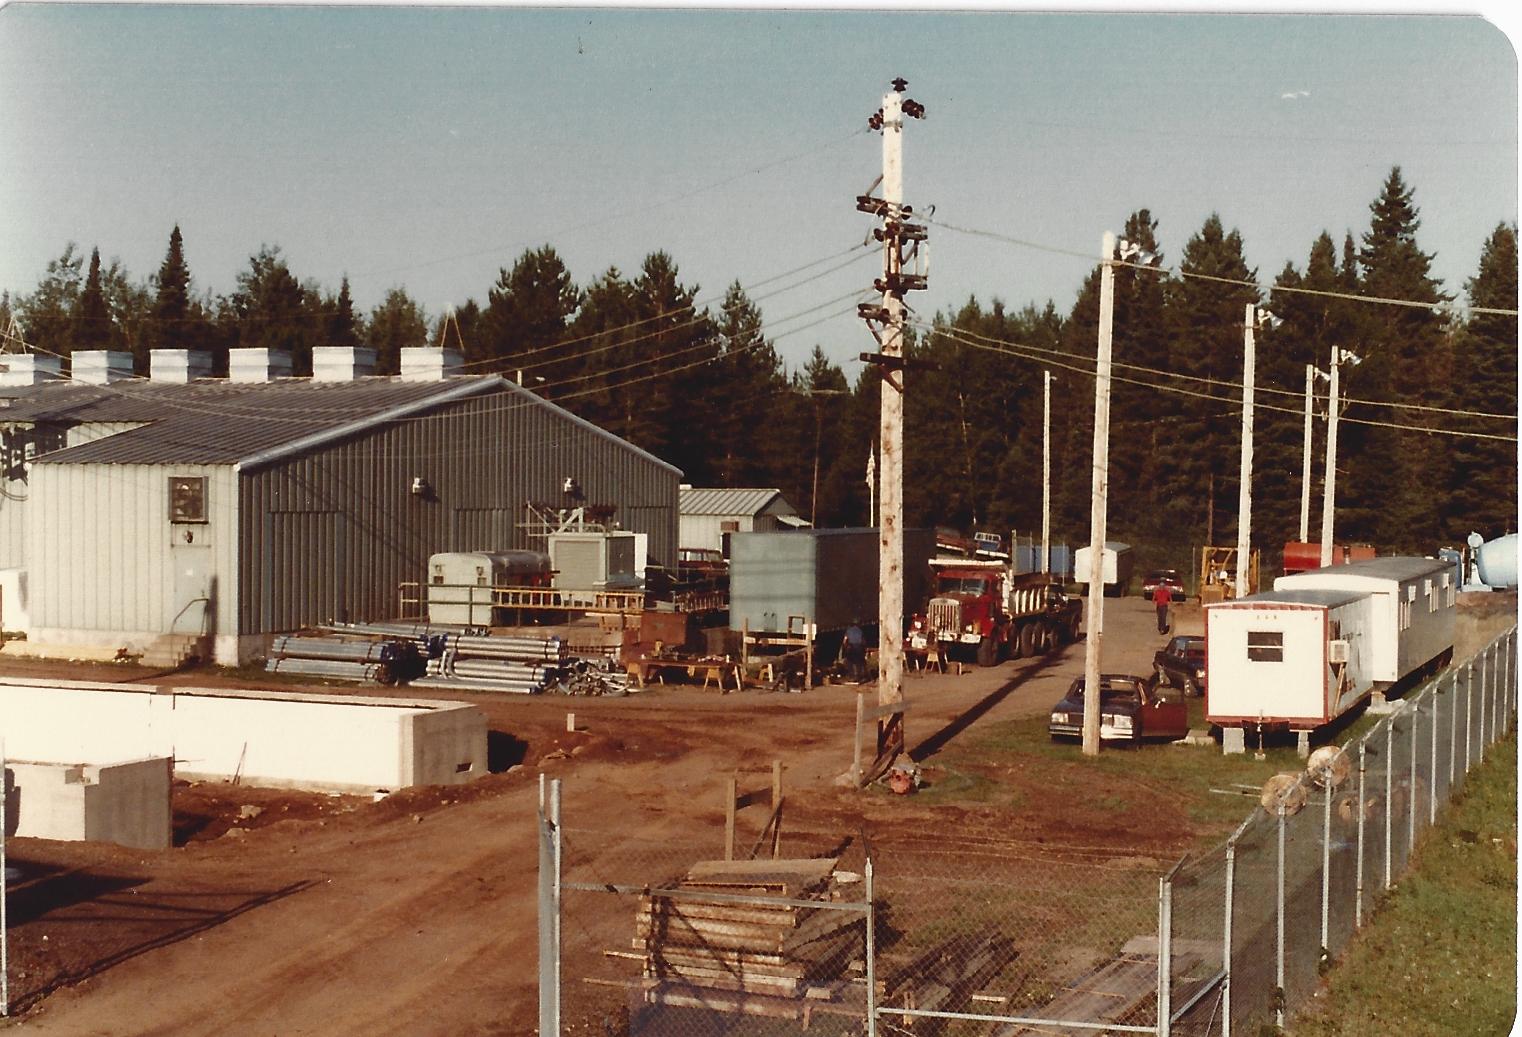 Usn Elf Communications System